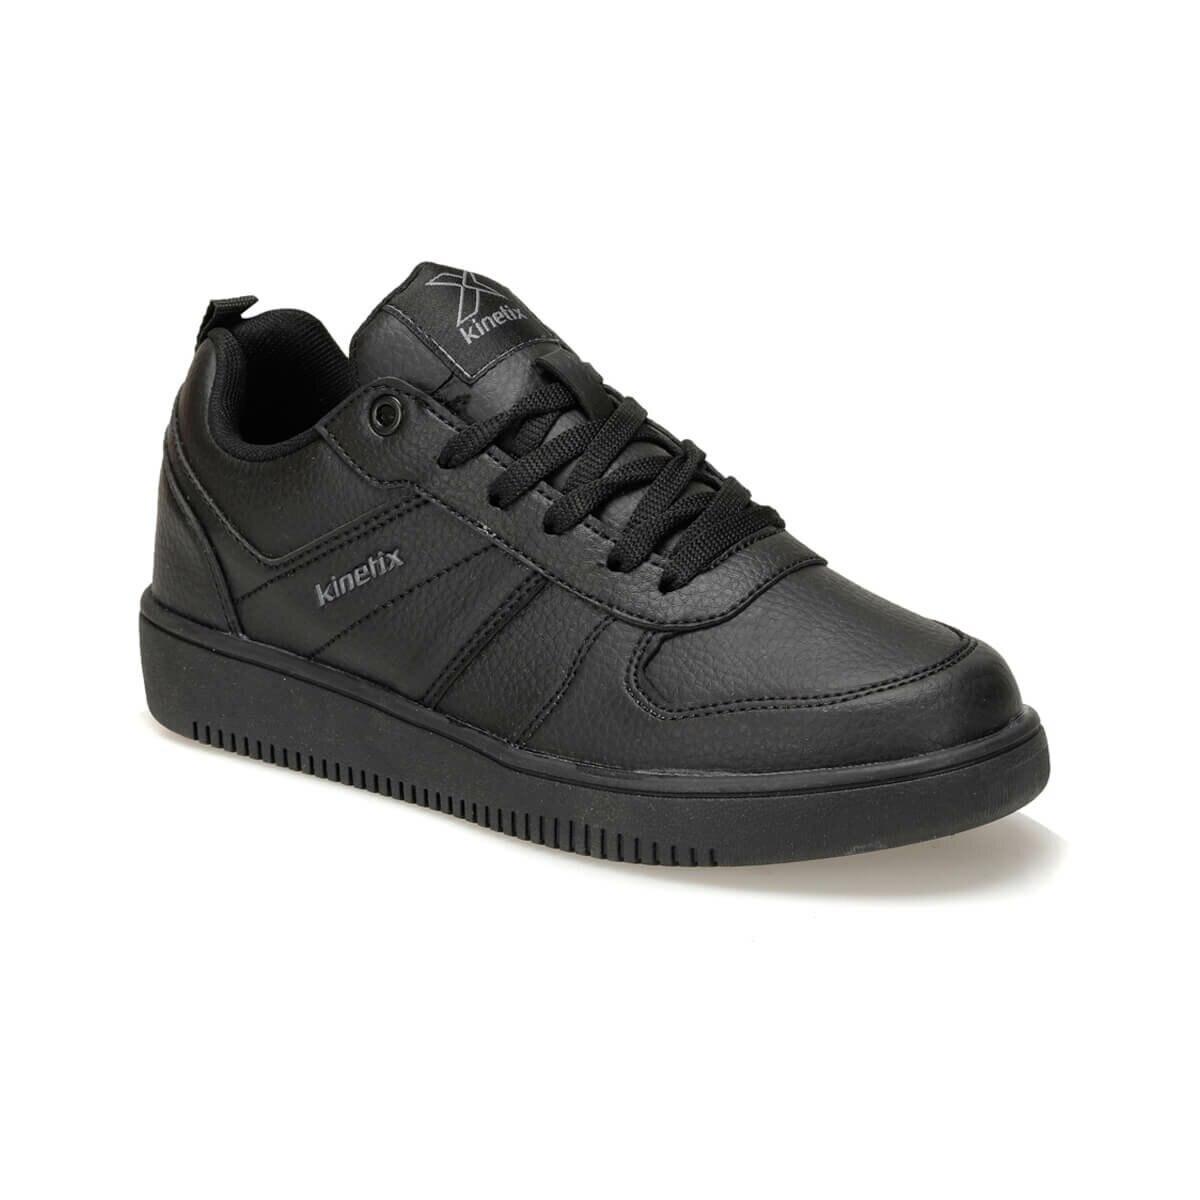 FLO IKTUS M 9PR Black Men 'S Sneaker Shoes KINETIX